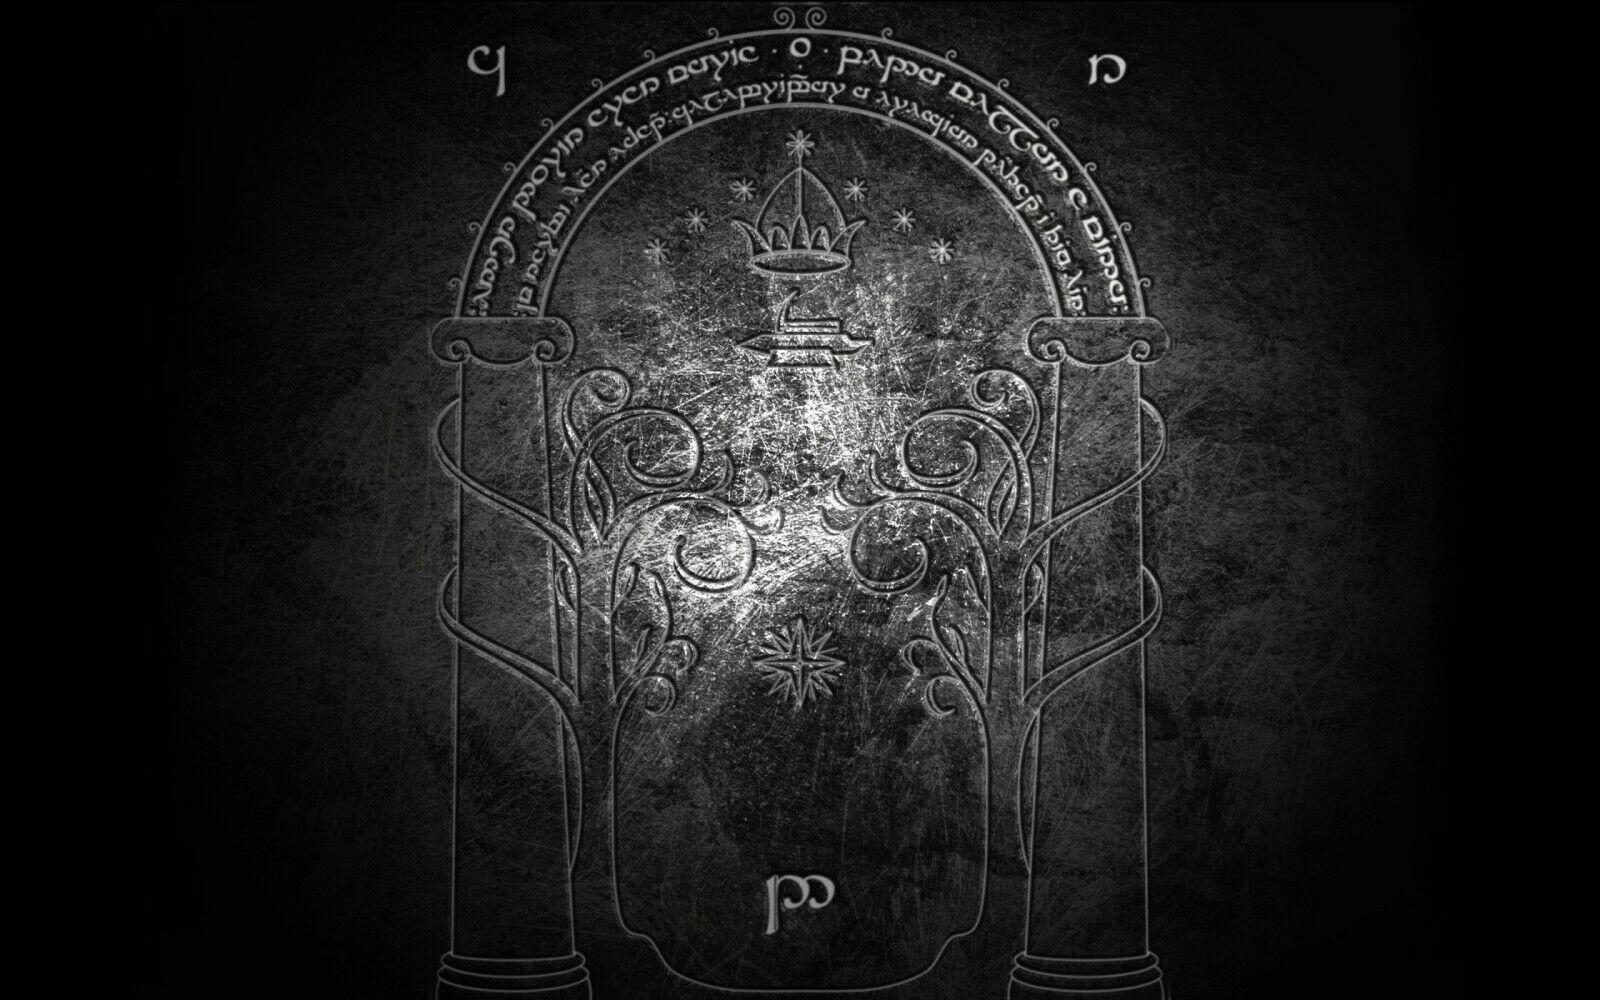 Pin By Tatyana Andreeva On Jrrt Tolkien Mines Of Moria Jrr Tolkien